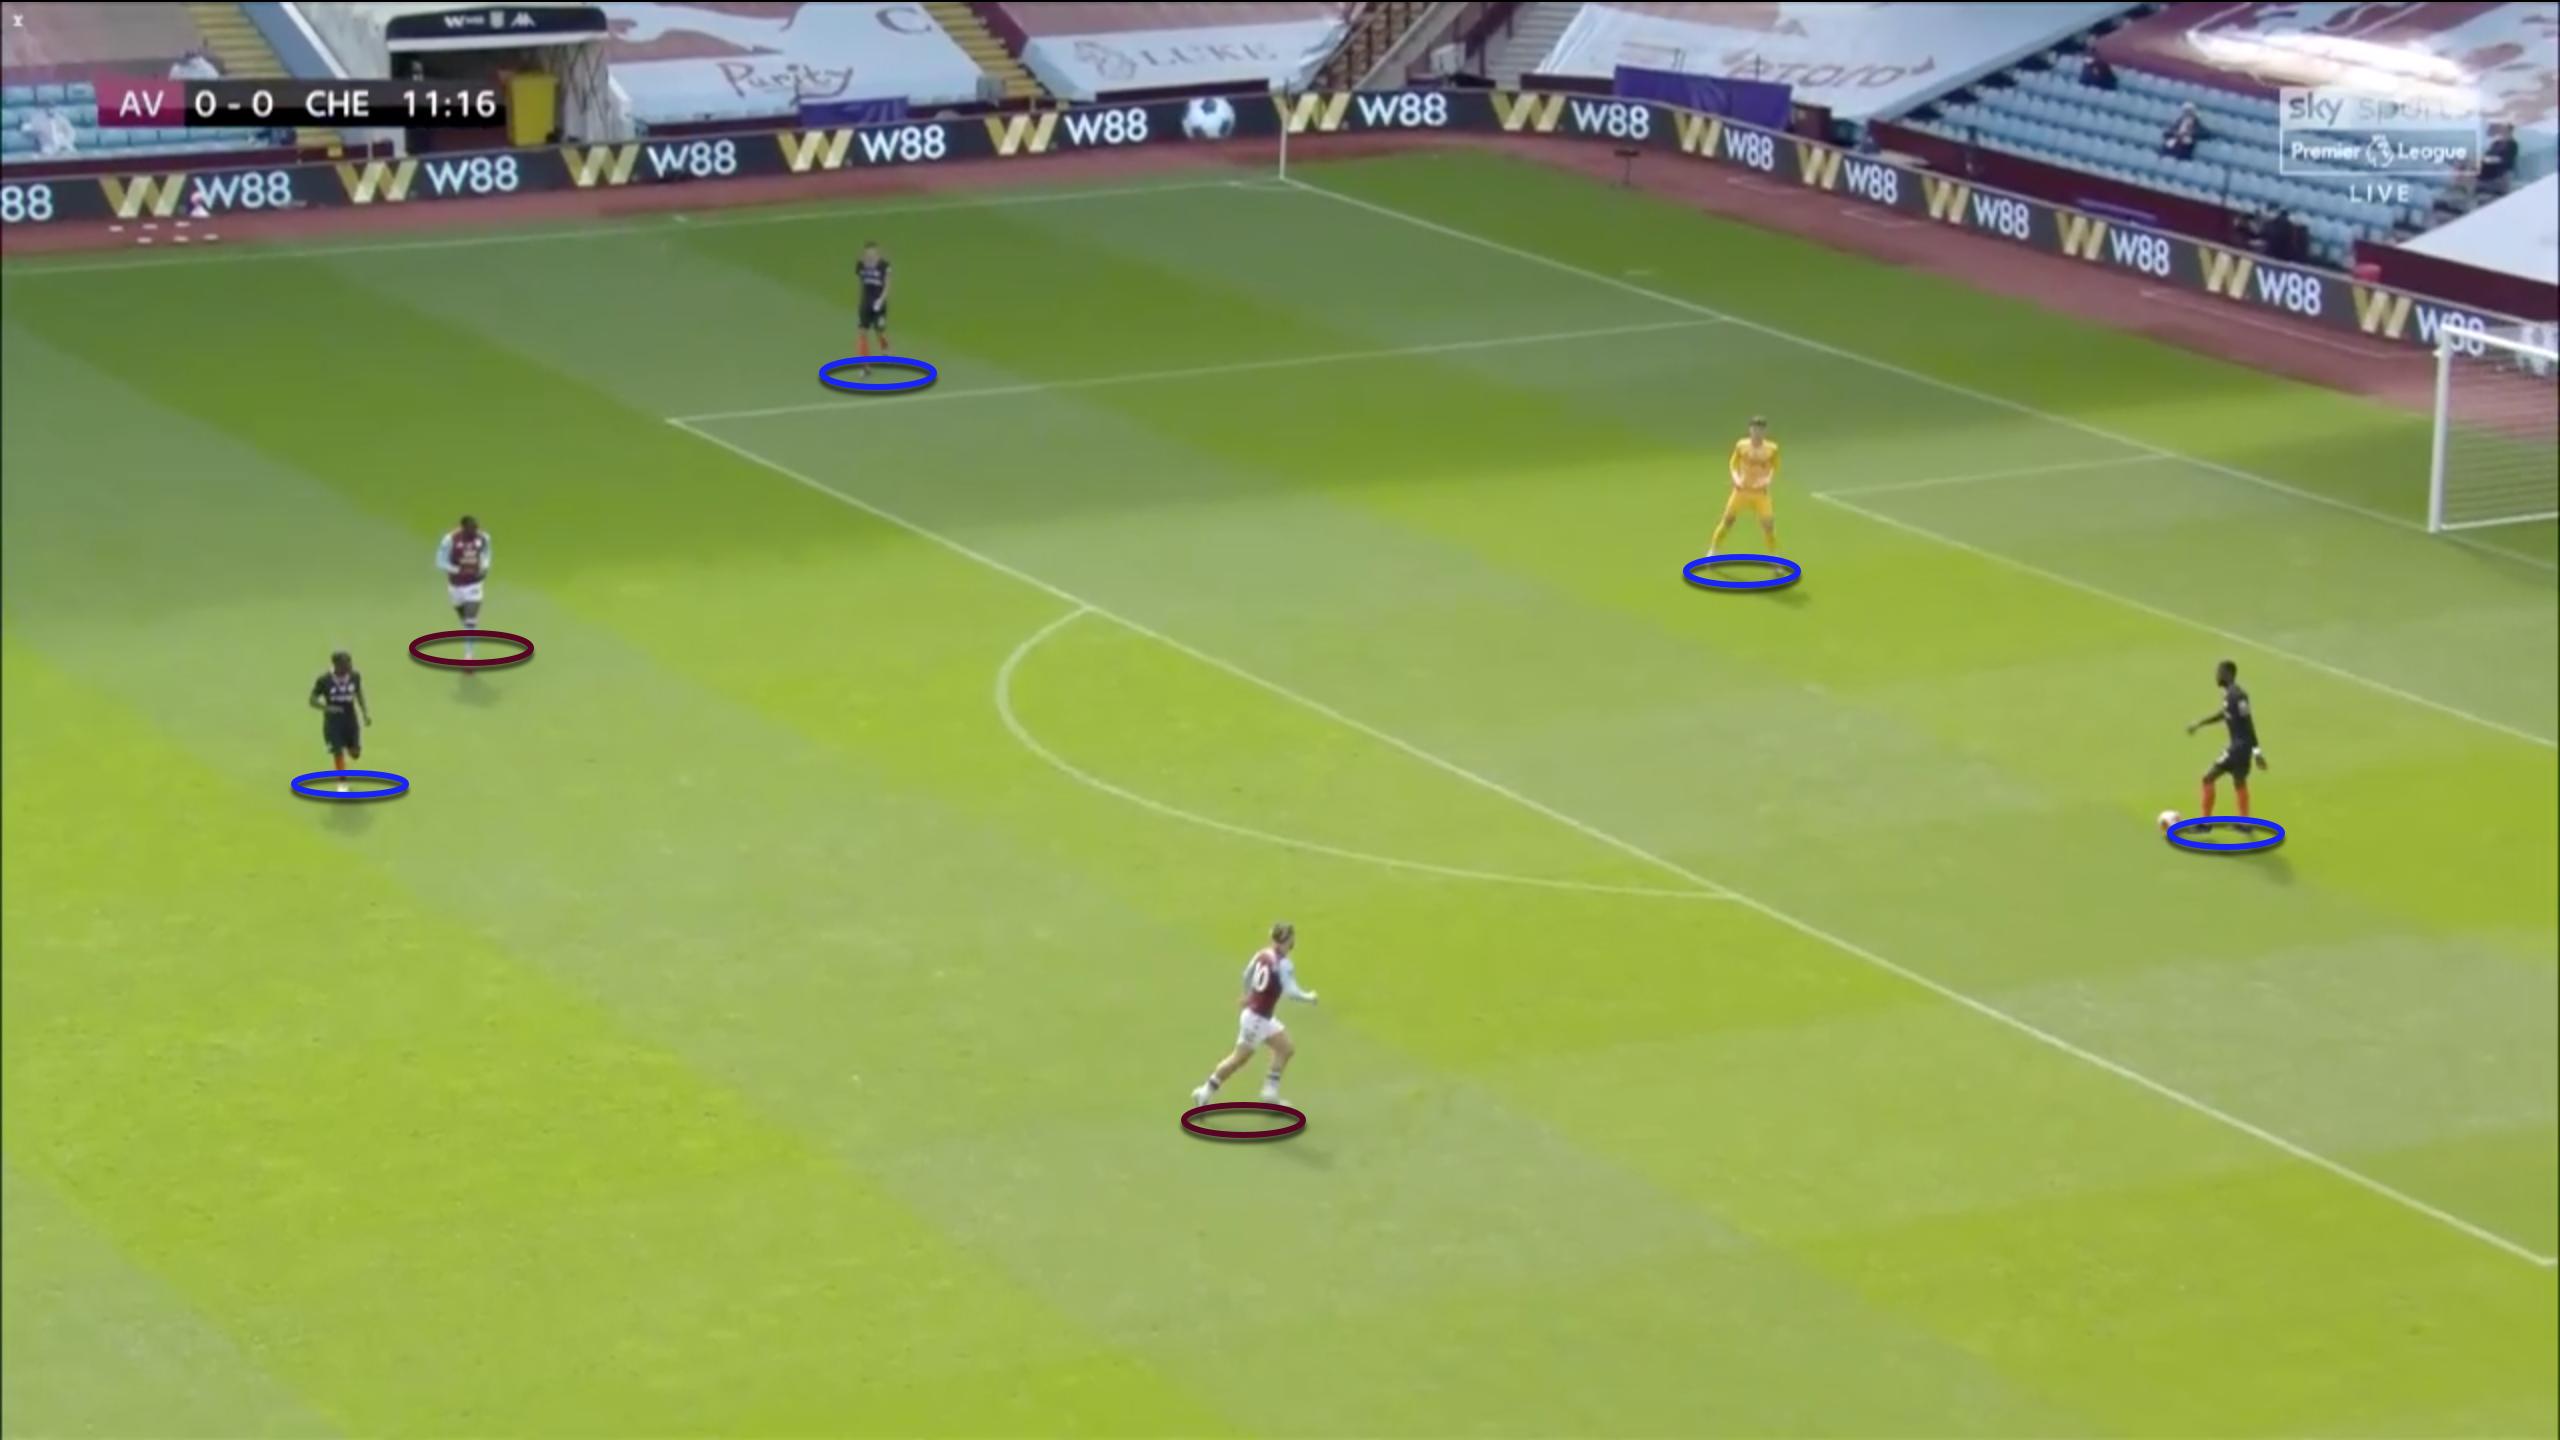 Premier League 2019/20: Aston Villa vs Chelsea - tactical analysis tactics analysis